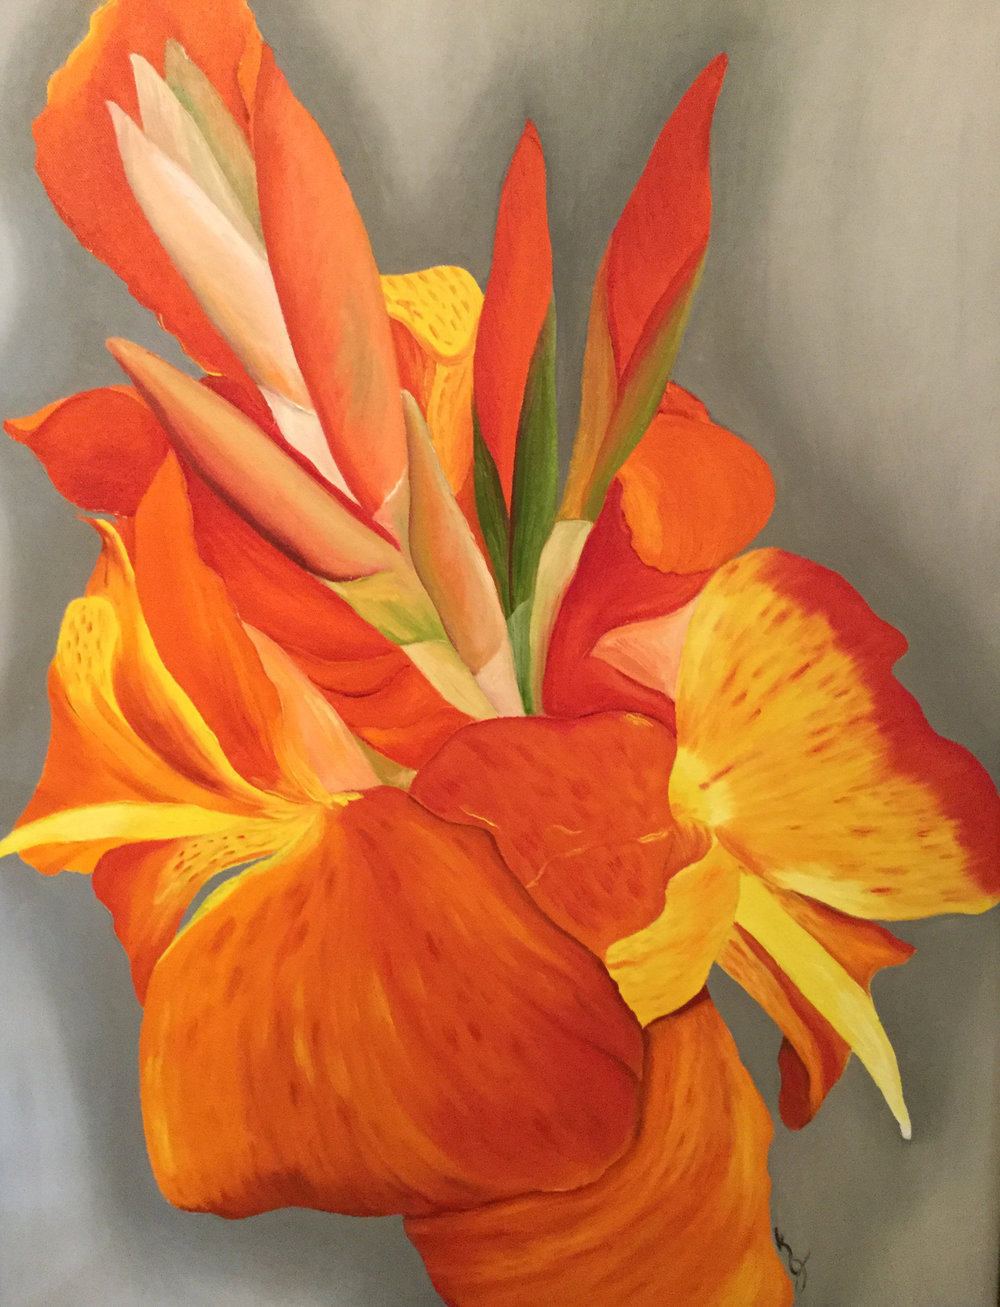 Orange Cannas  2017 Oil on canvas 24 x 18 inches